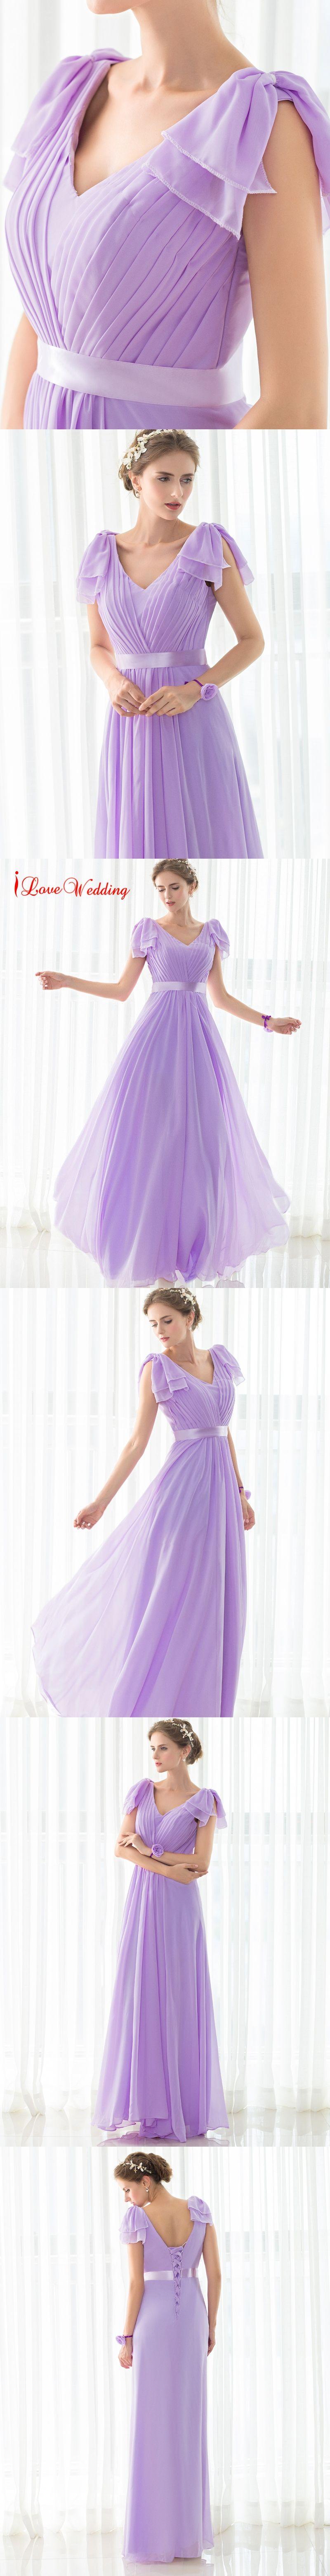 2017 Hot Sale Long Purple Bridesmaid Dresses Chiffon Pleat ...